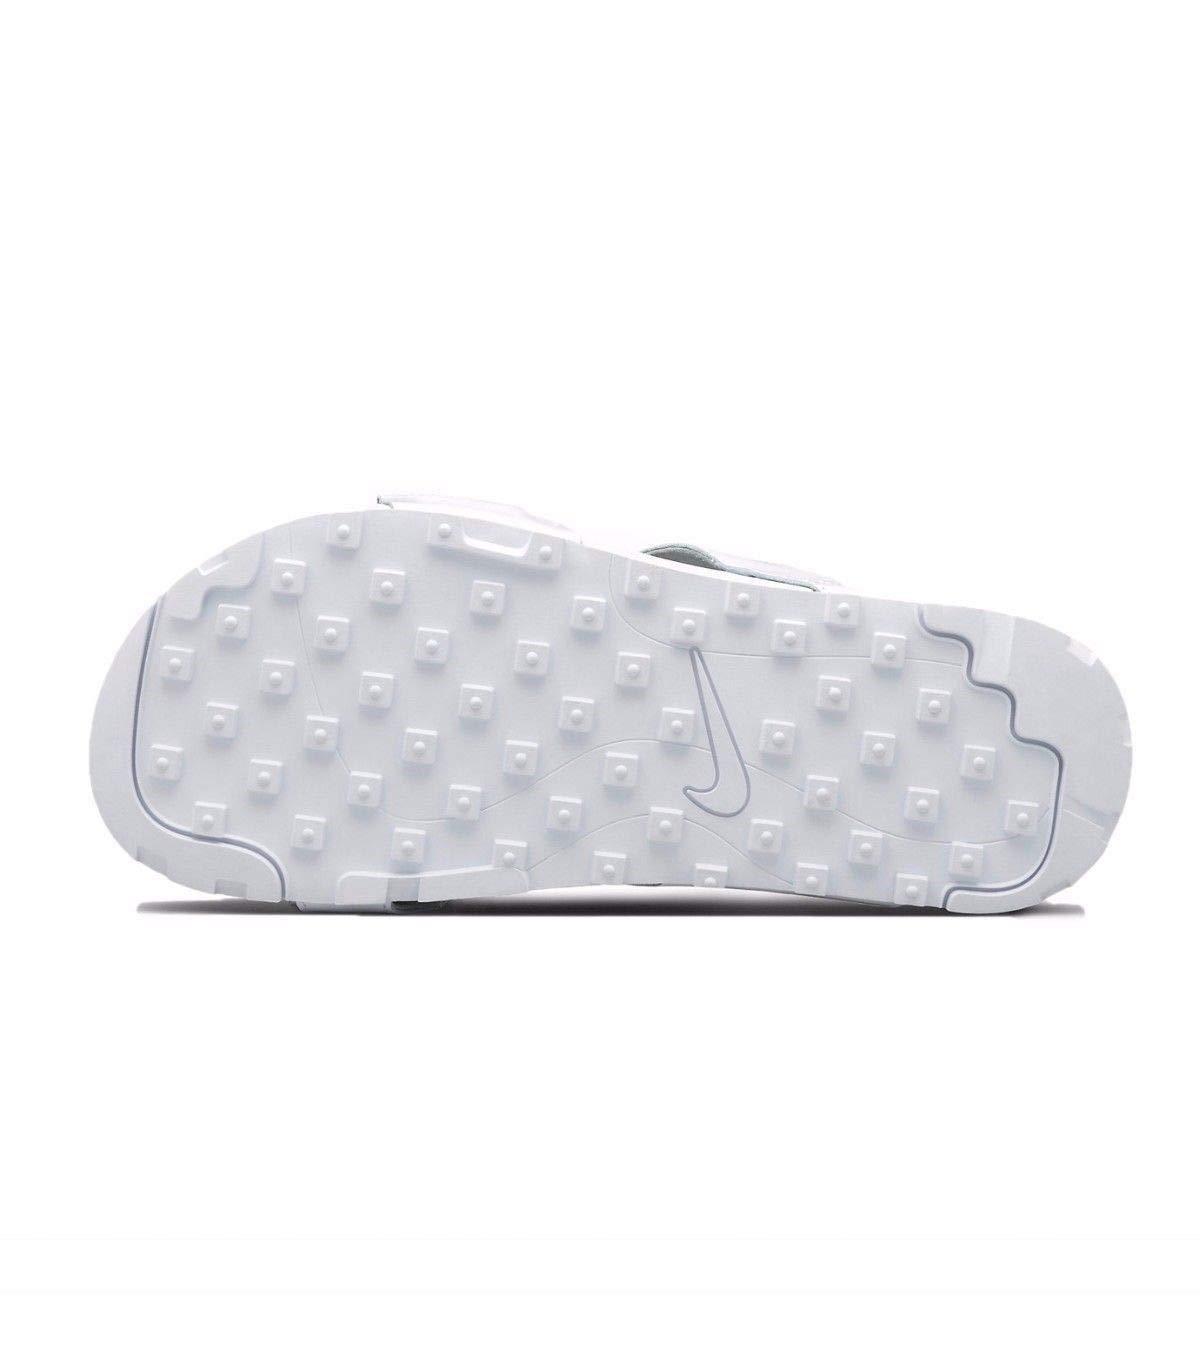 14e1ef2328ac Amazon.com  Nike Taupo 849756-100 White Blanc Men s Sandals Size 10 (1R12)   Sports Collectibles